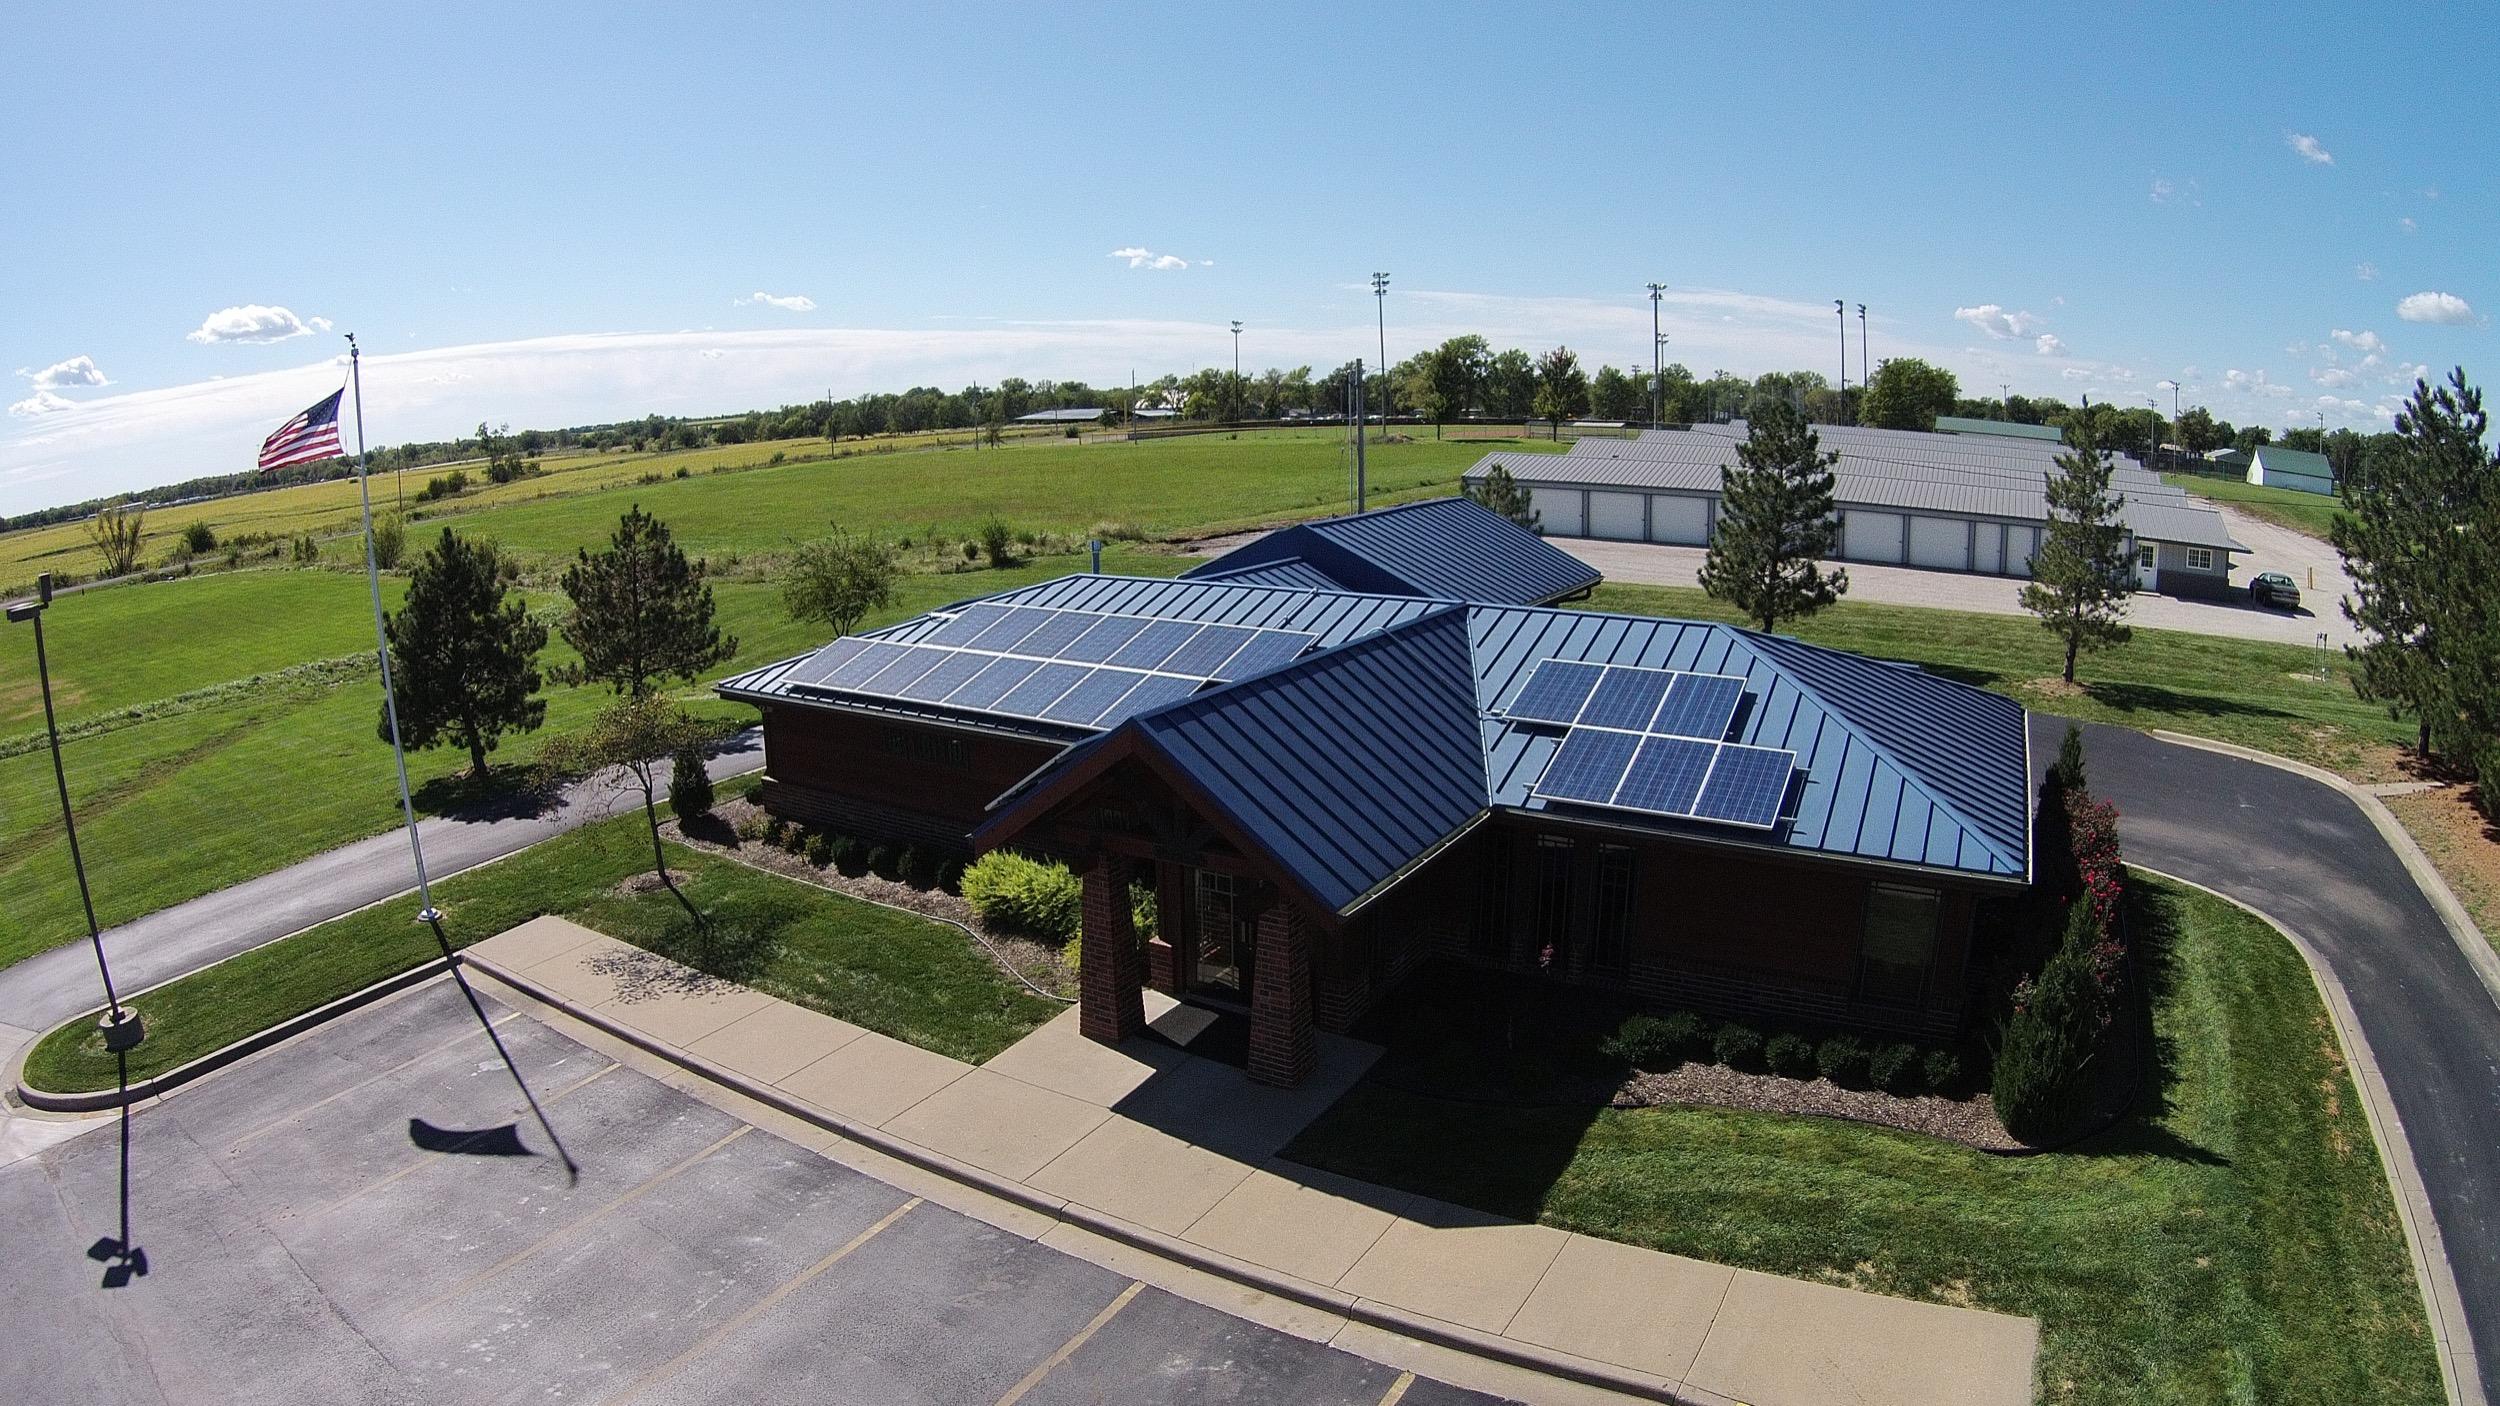 Wellsville Bank solar array © 2015 Cromwell Environmental